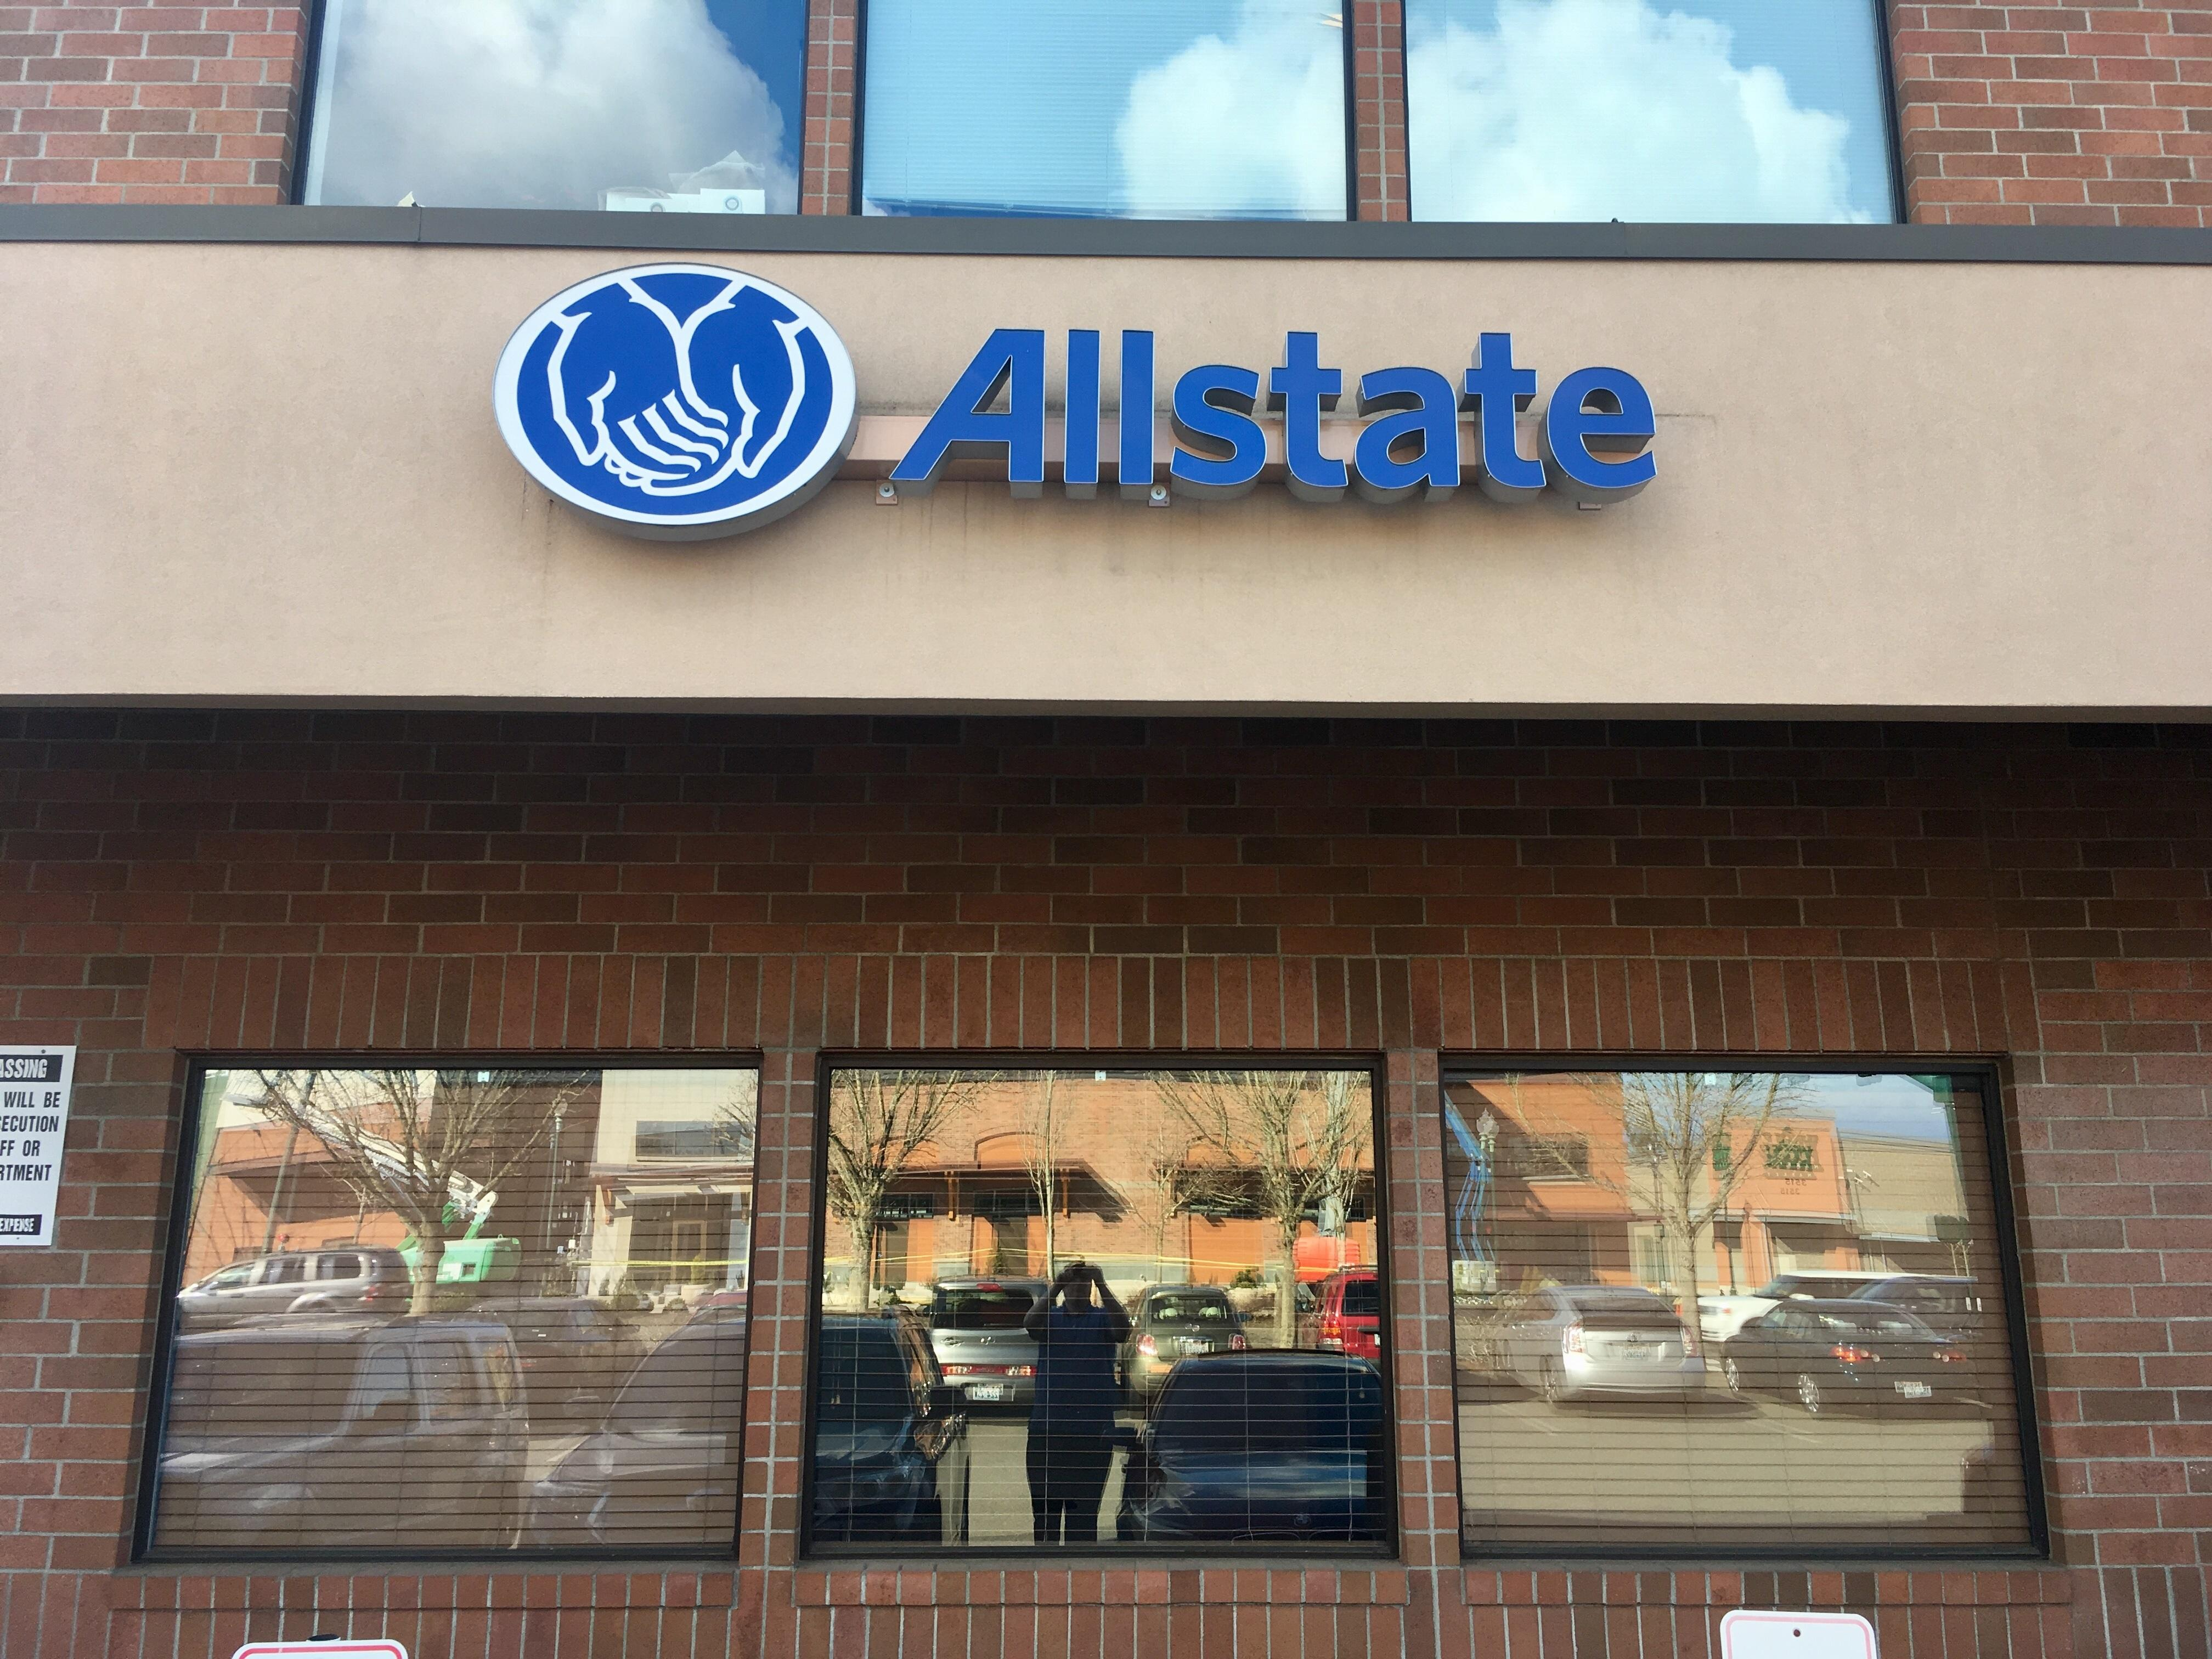 Larson Financial & Insurance: Allstate Insurance image 2